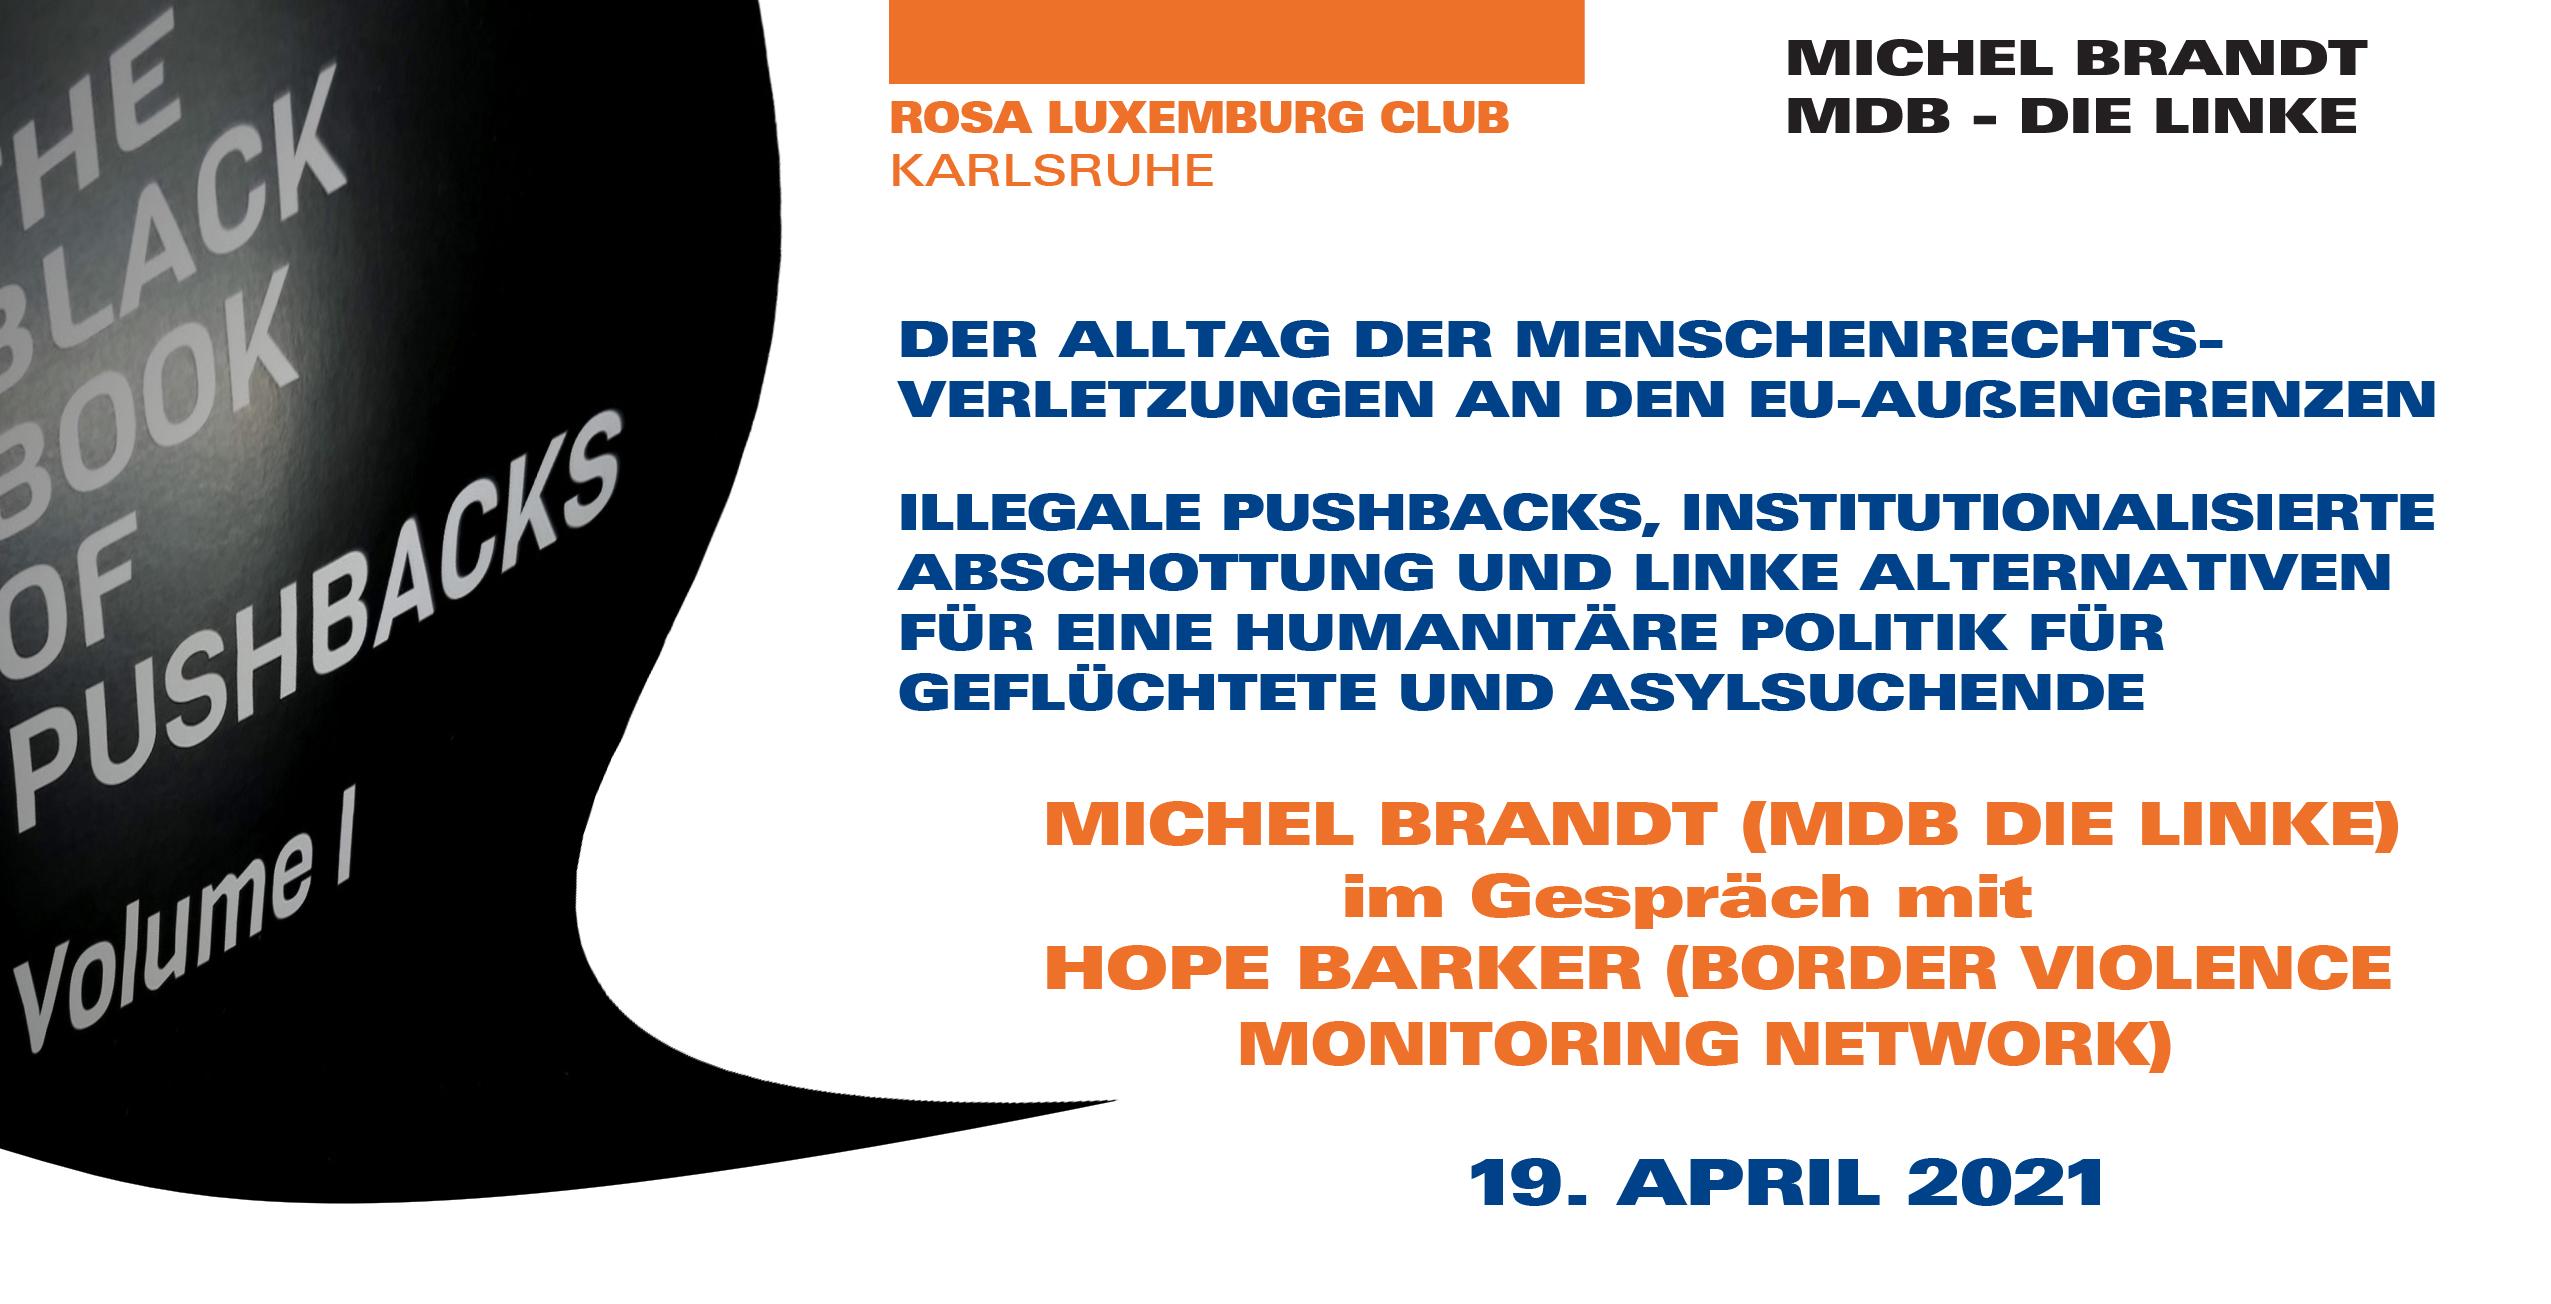 Das «Schwarzbuch Push-Backs». Menschenrechtsverletzungen an den EU-Außengrenzen